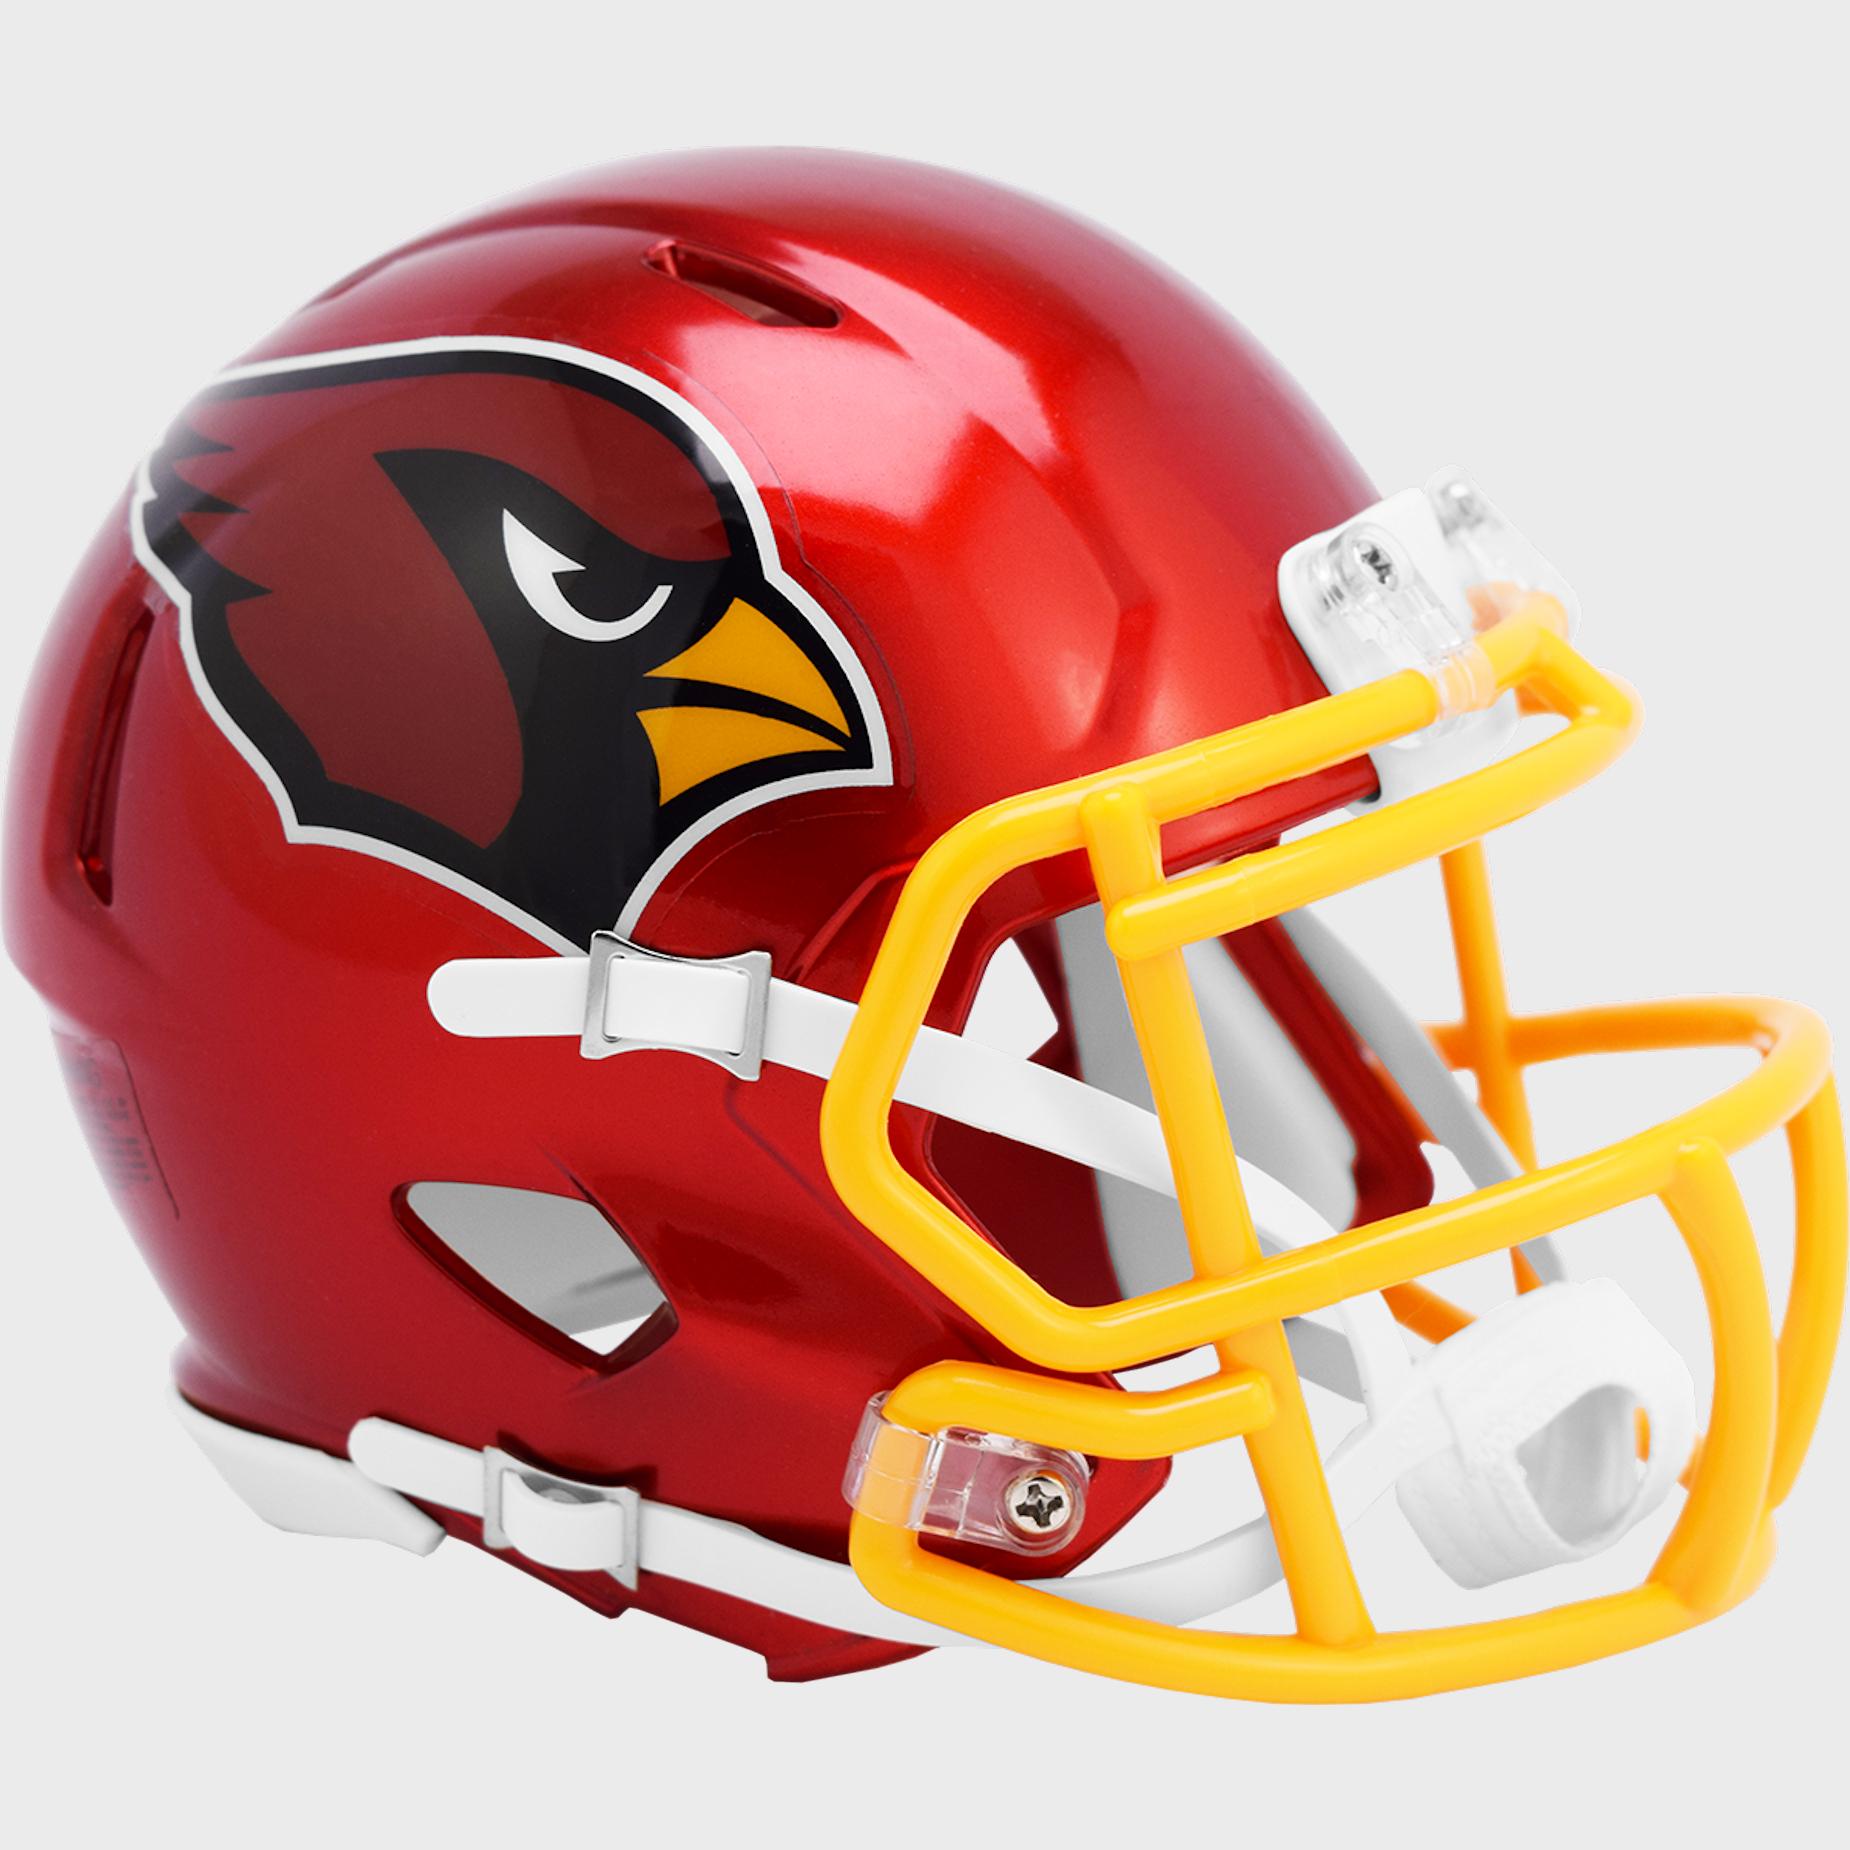 Arizona Cardinals Speed Mini Football Helmet <B>FLASH ESD 8/21/21</B>